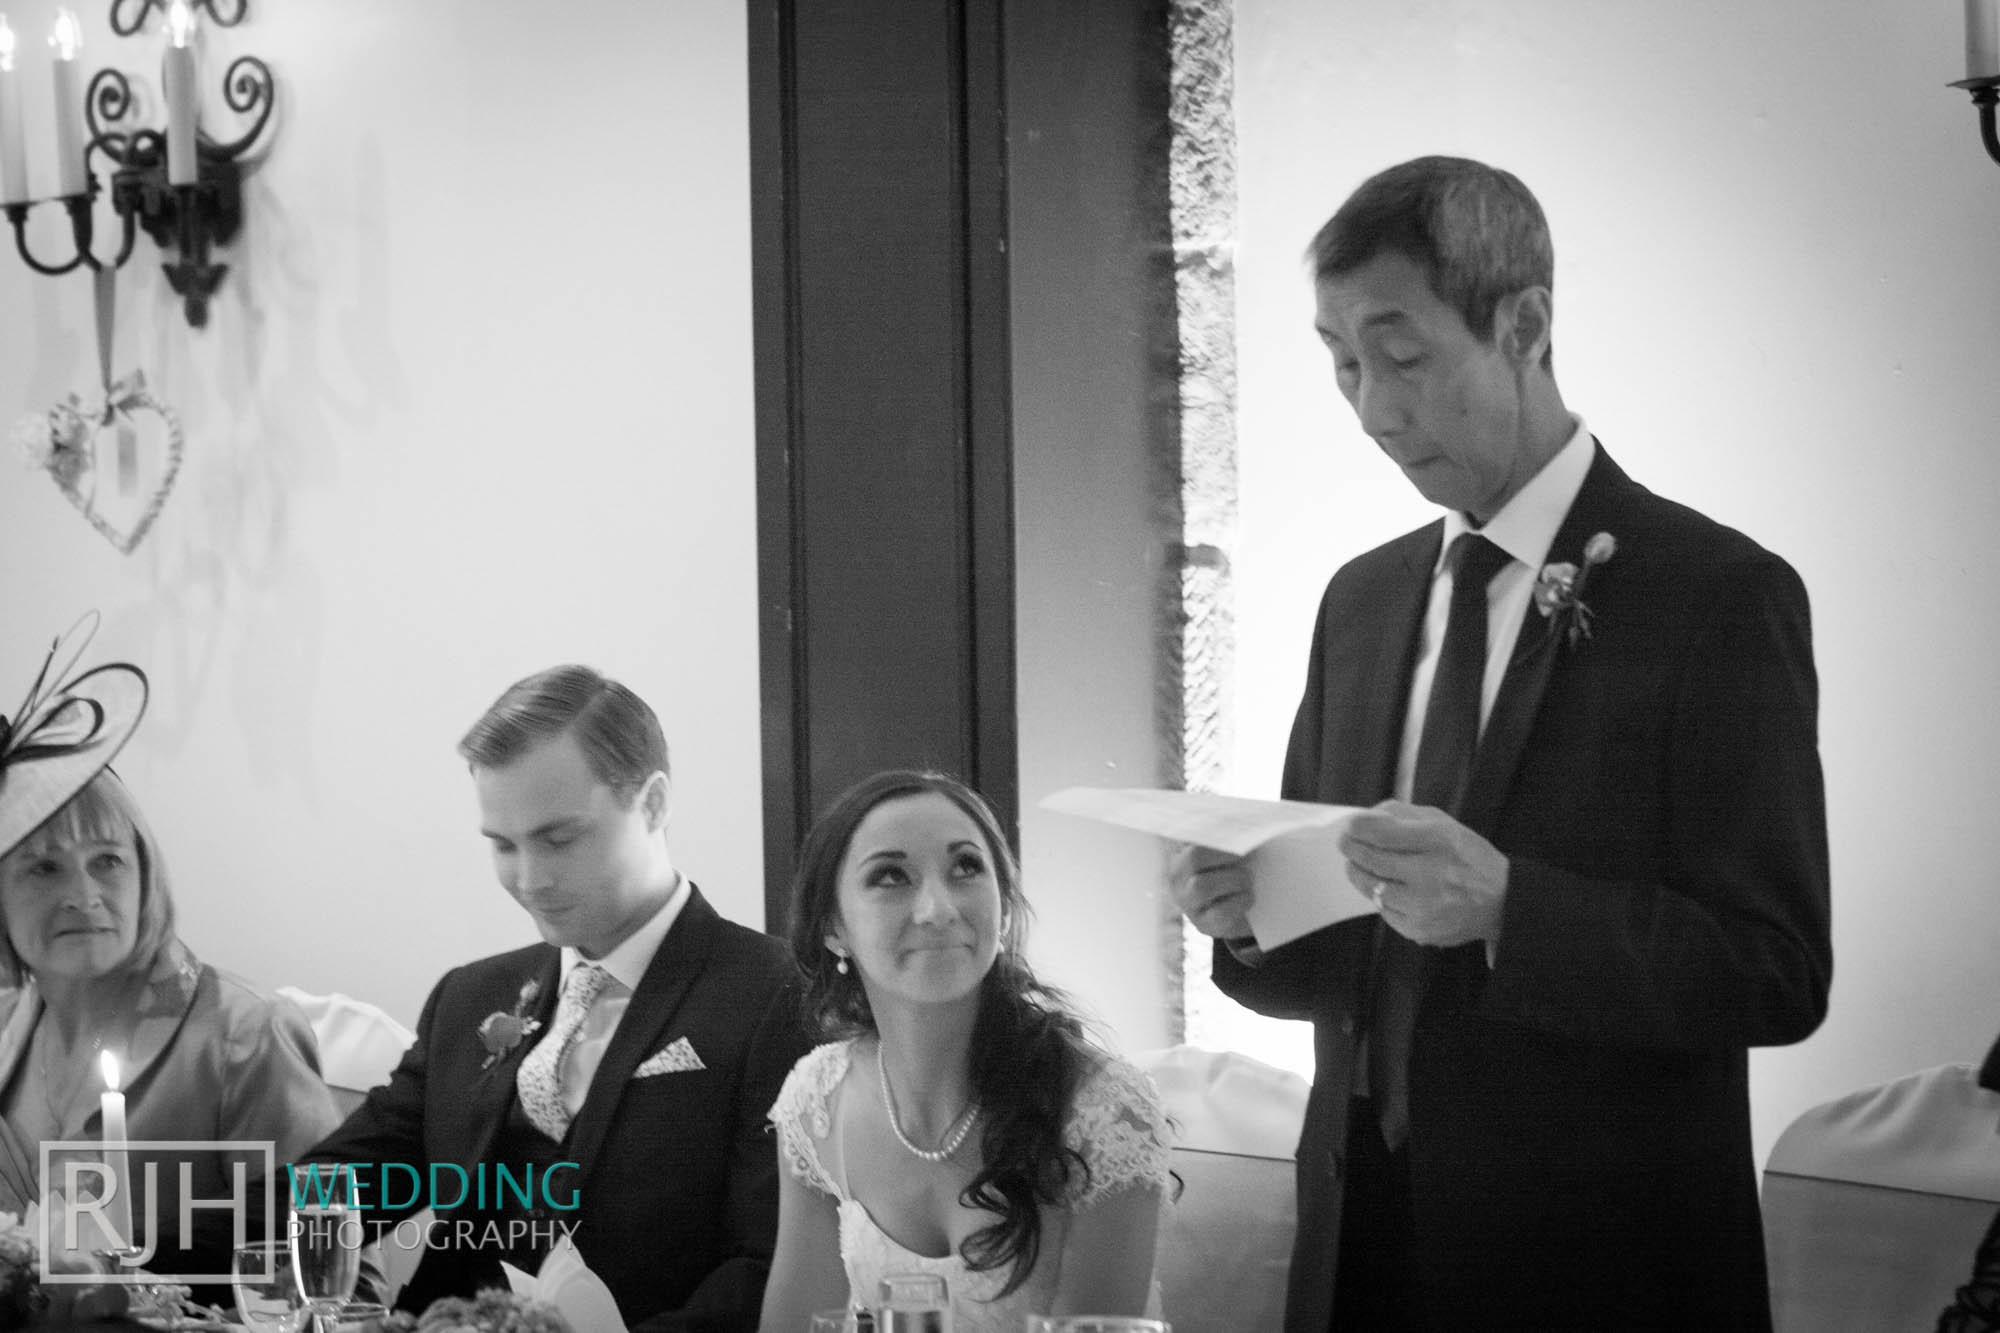 RJH Wedding Photography_Tankersley Manor Wedding_45.jpg